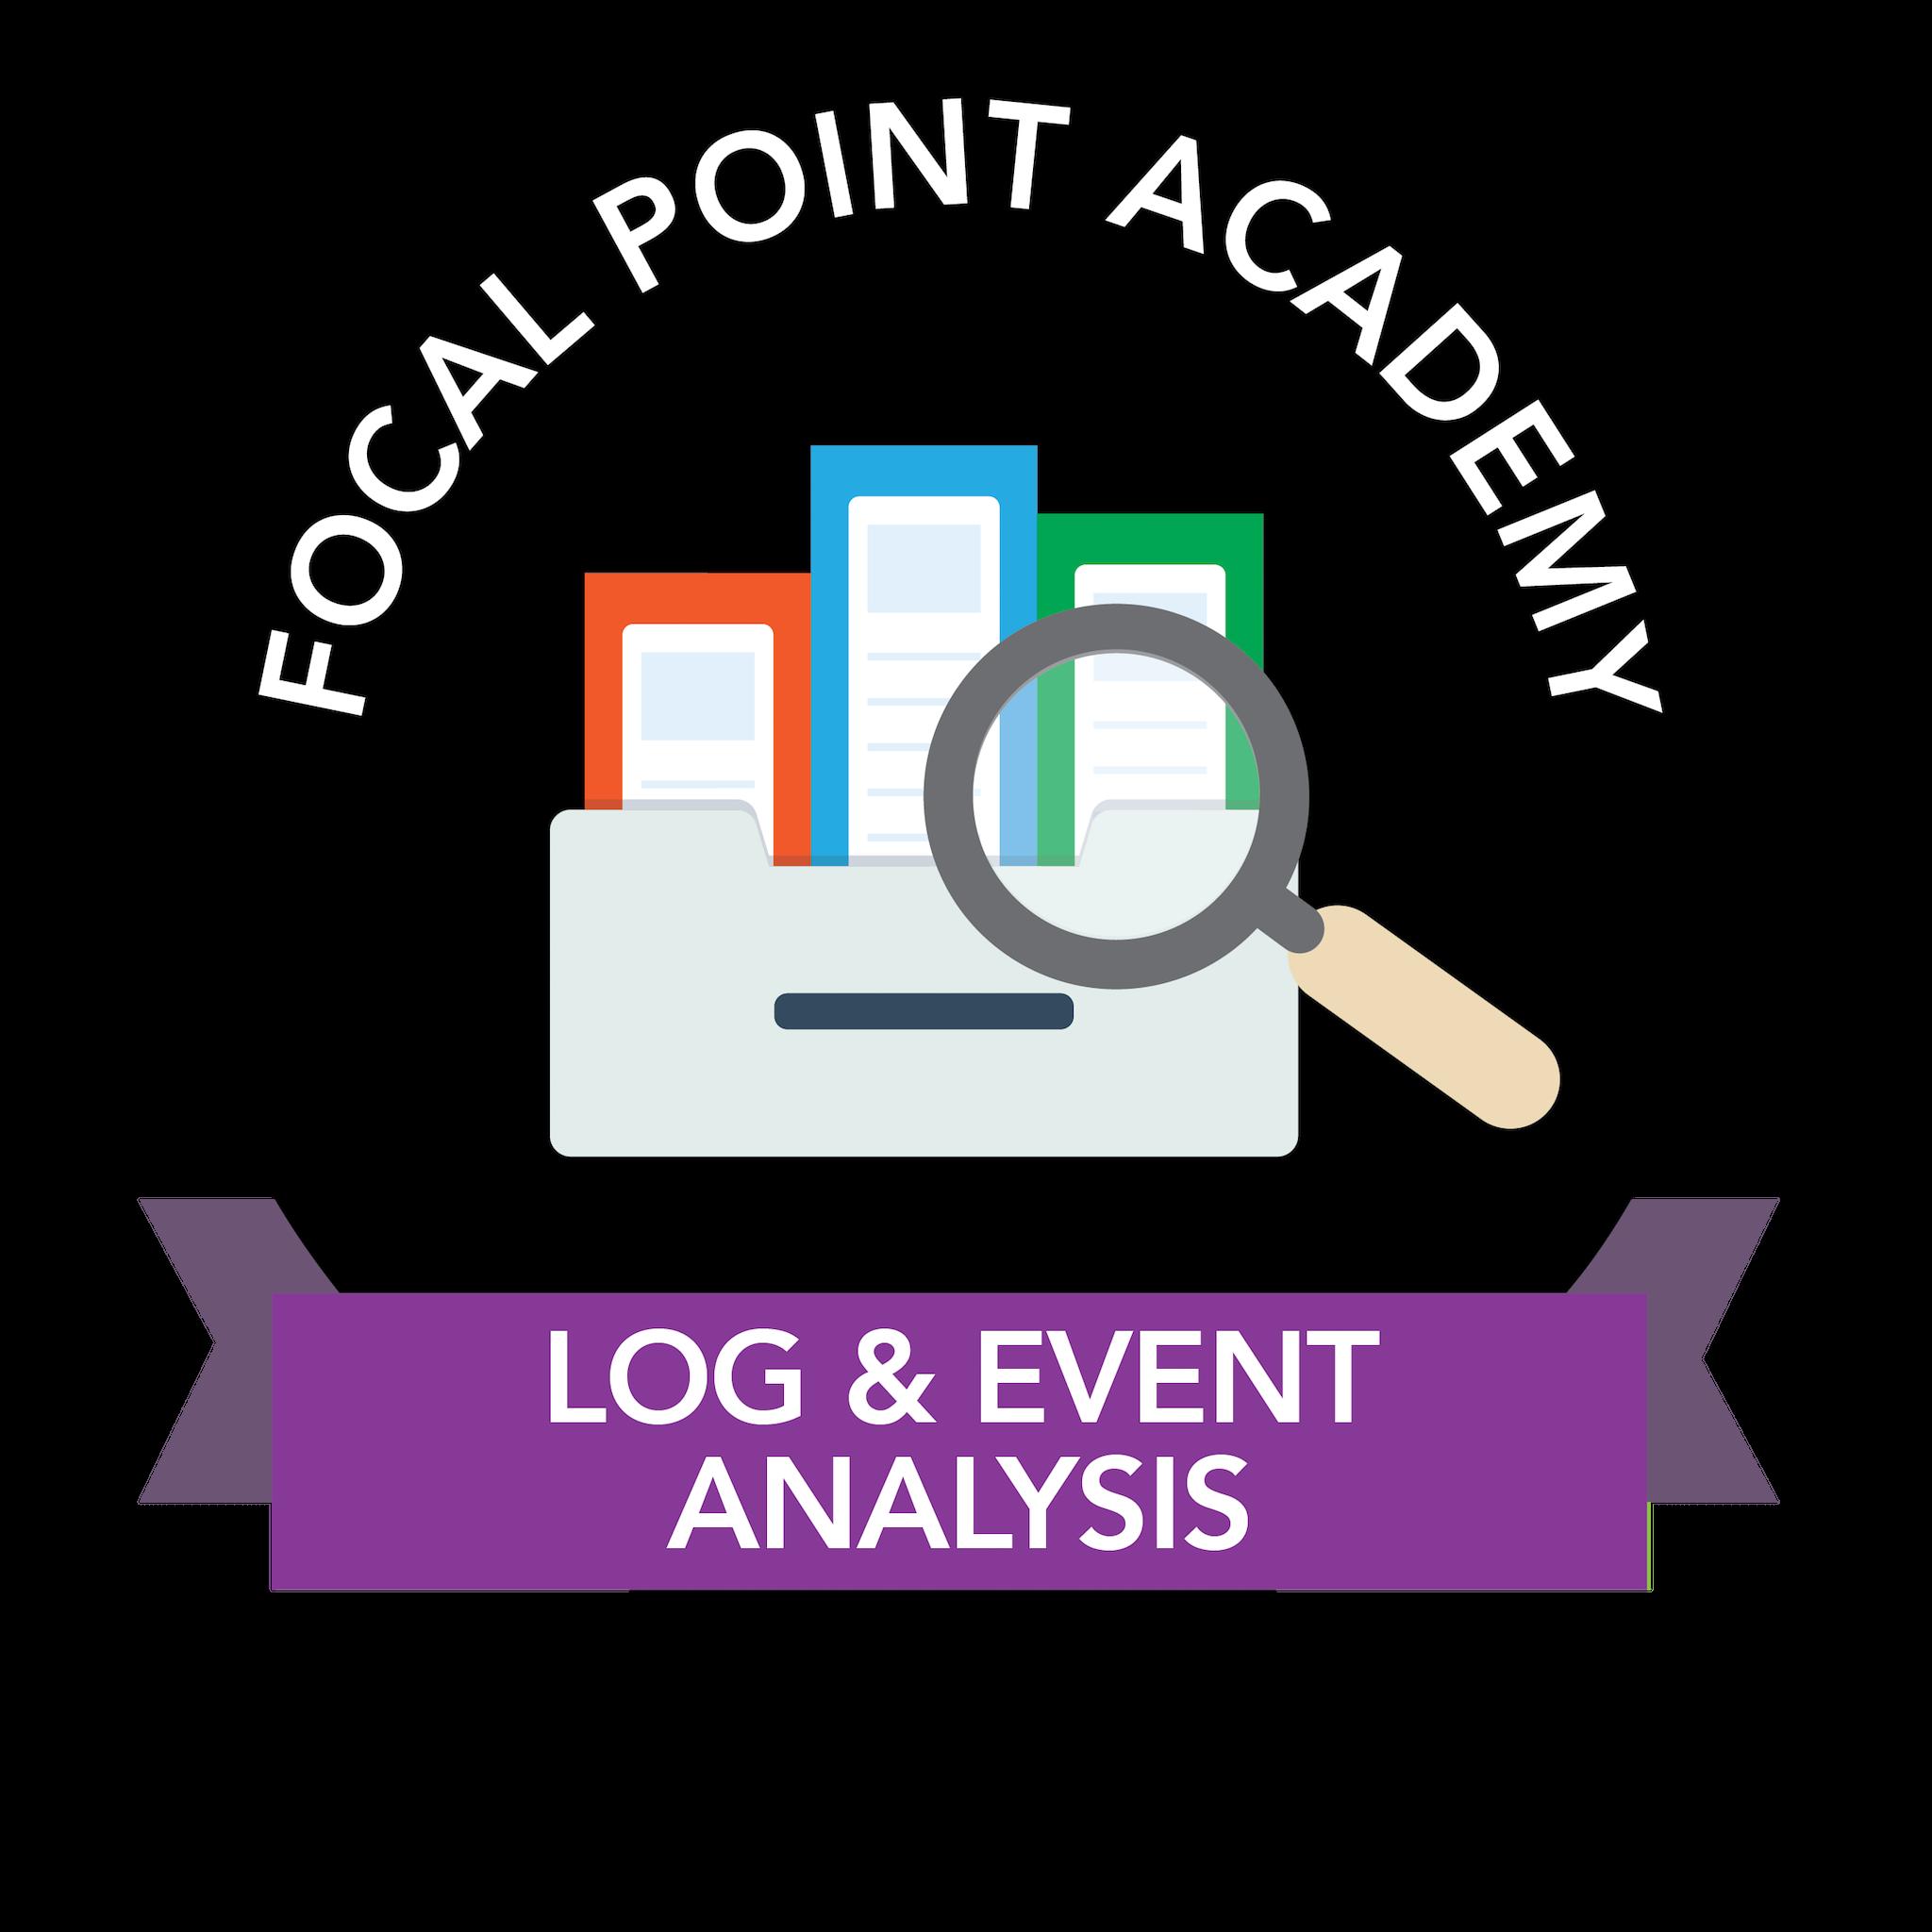 System & Event Log Analysis